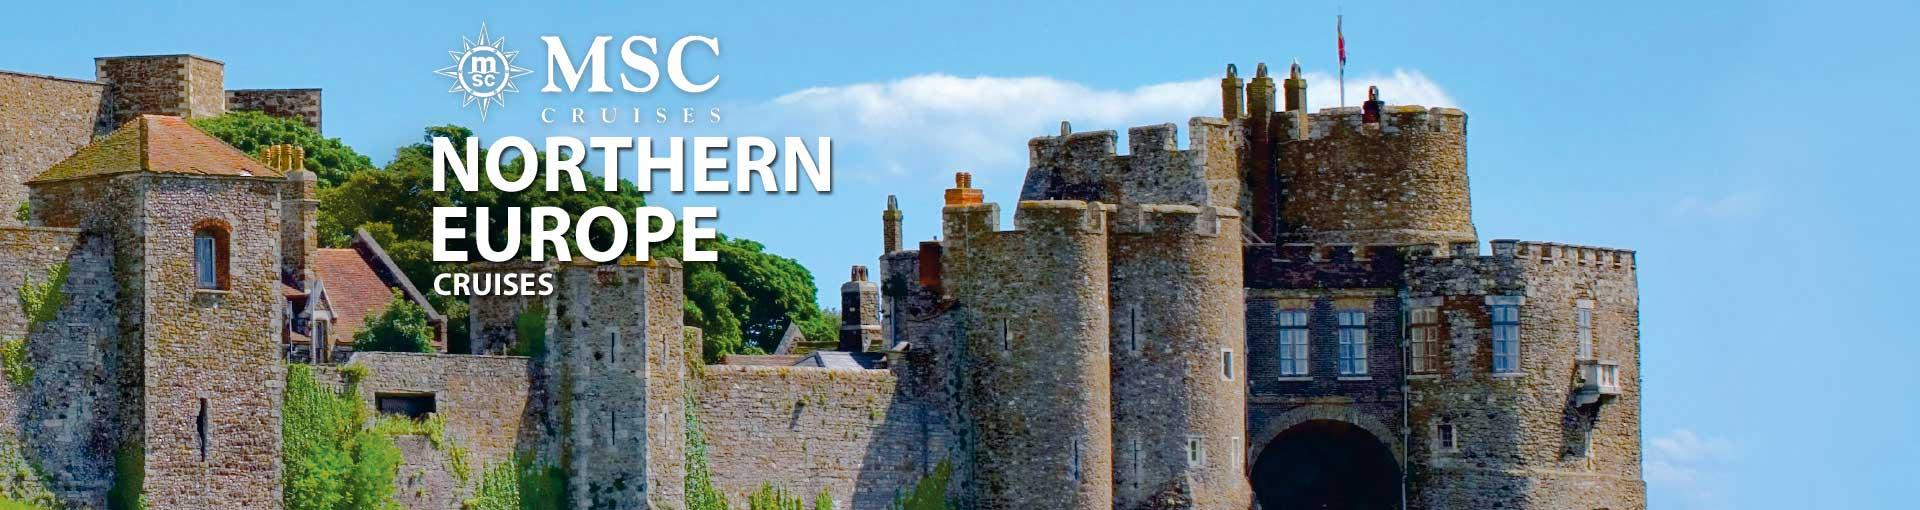 MSC Cruises Northern Europe Cruises